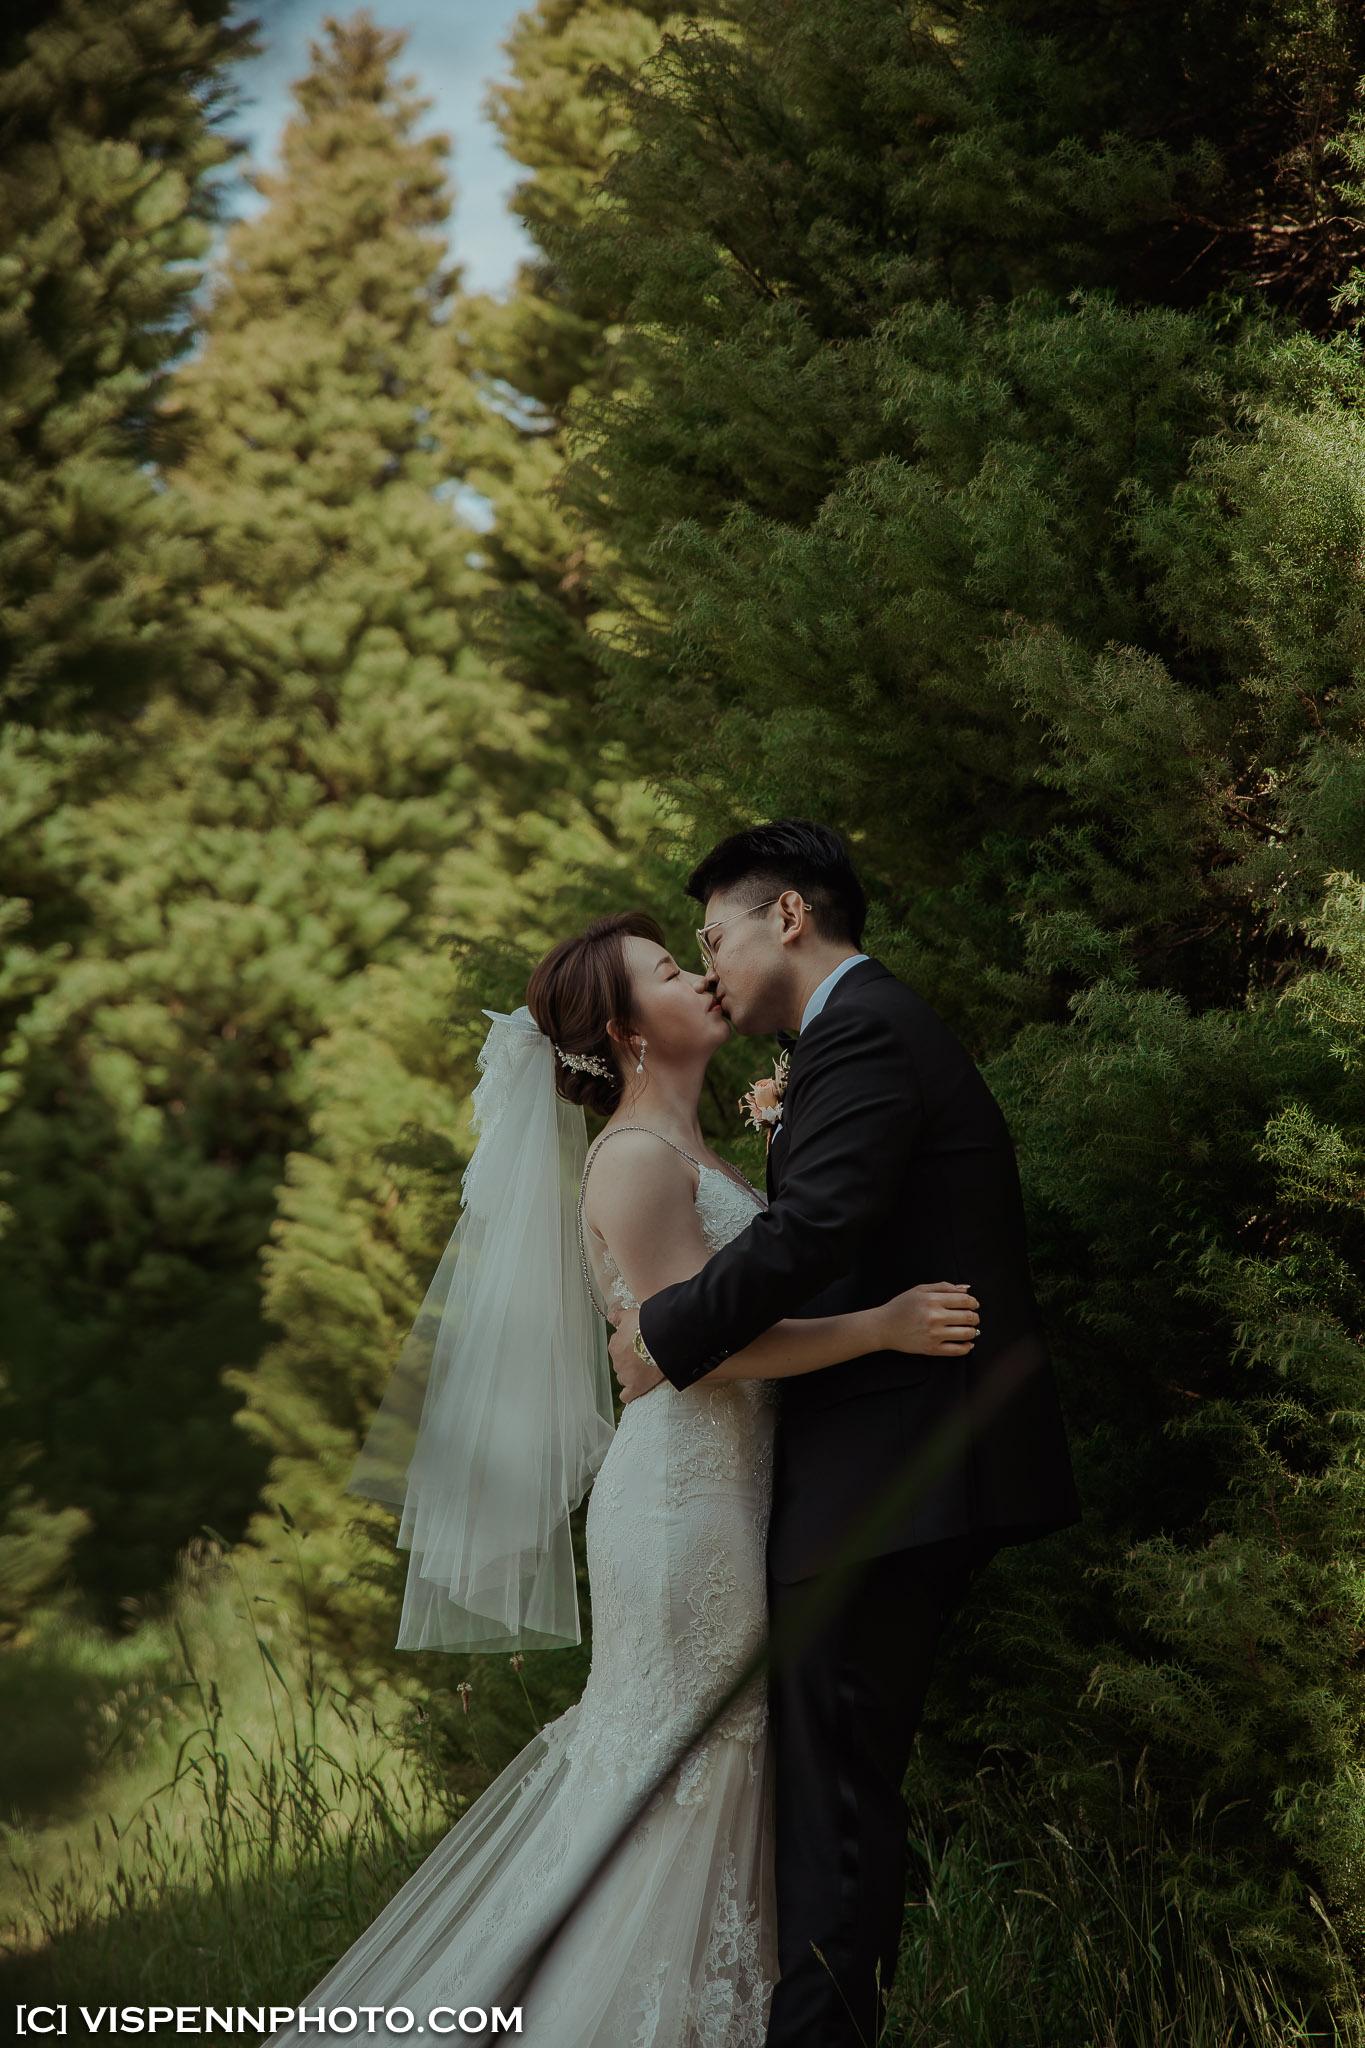 WEDDING DAY Photography Melbourne ElitaPB 06428 1P EOSR ZHPENN